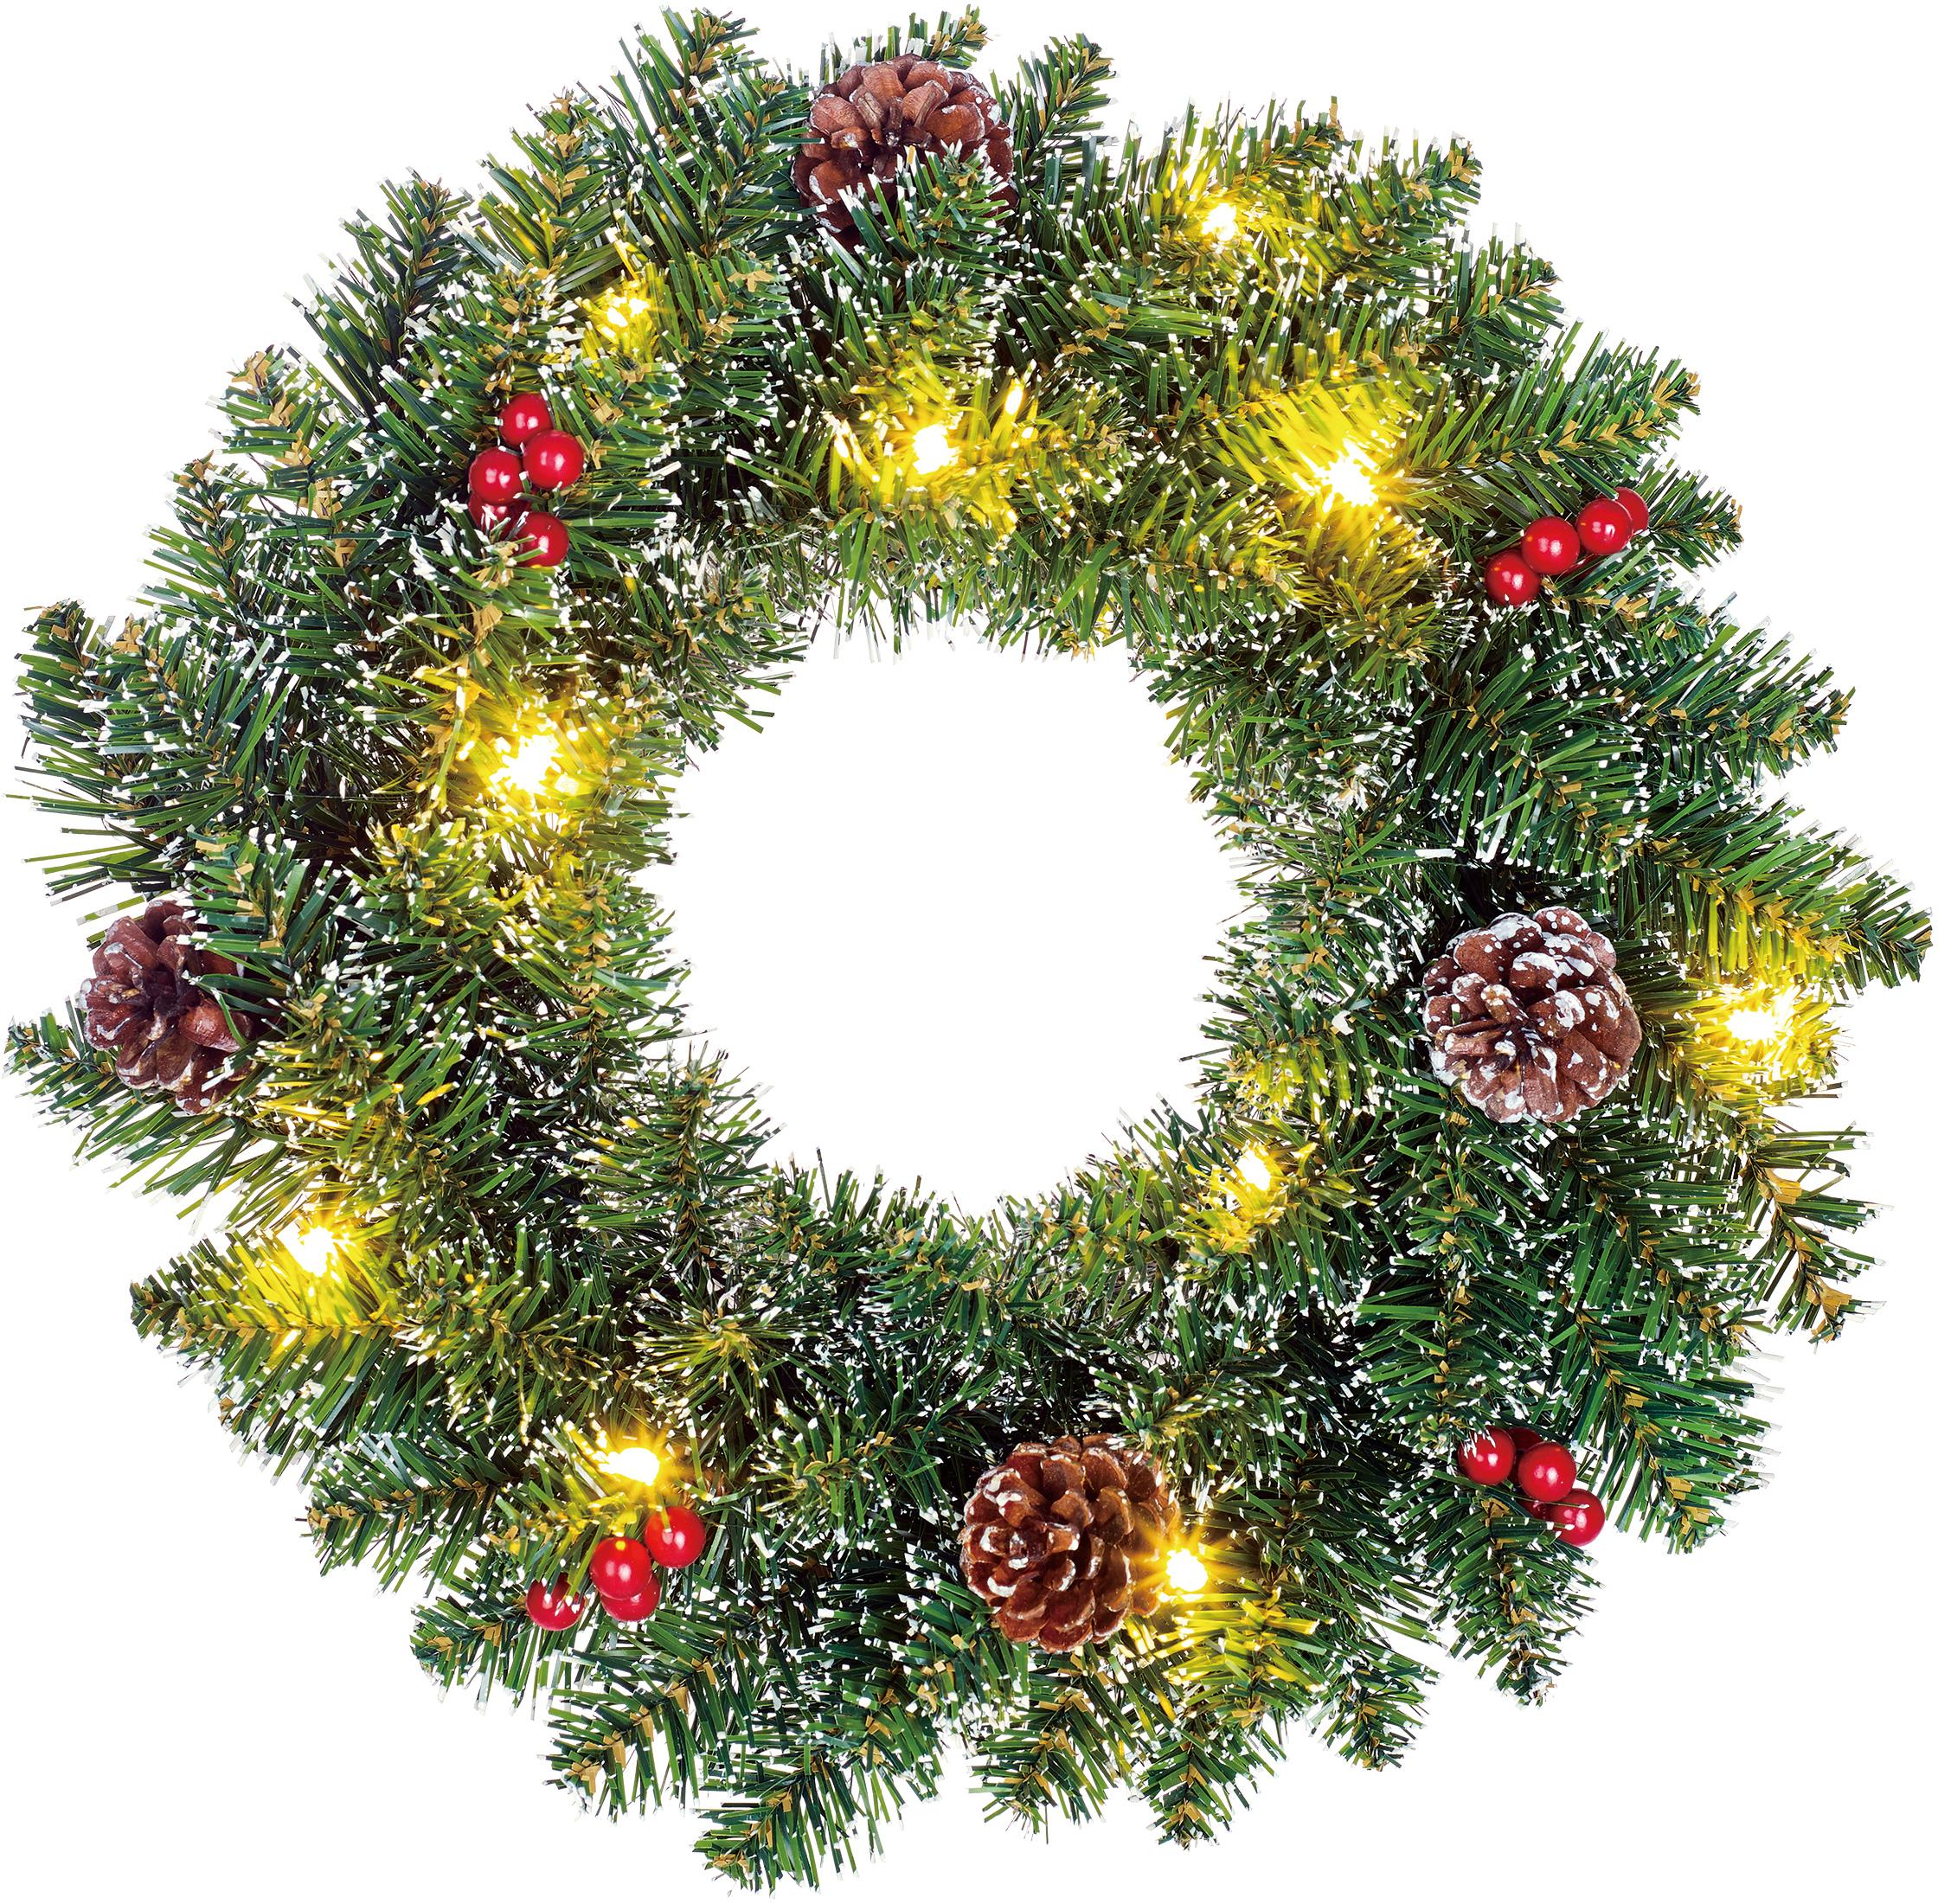 Corona navideña LED Creston, Plástico, Verde, rojo, marrón, Ø 35 cm